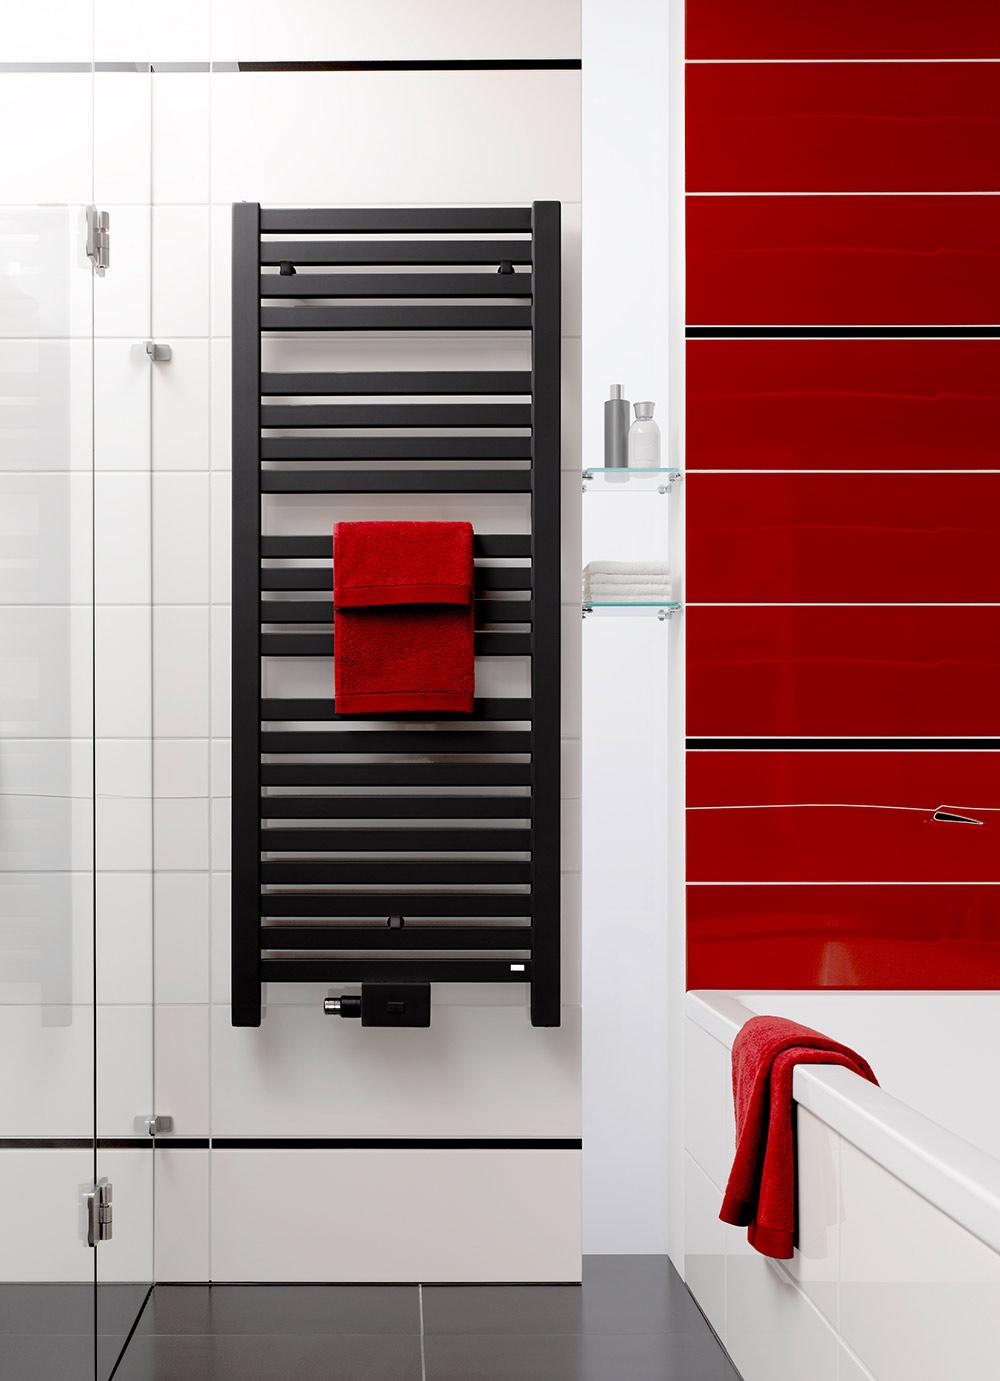 heizk rper von mundt preuss aus bad m nder. Black Bedroom Furniture Sets. Home Design Ideas